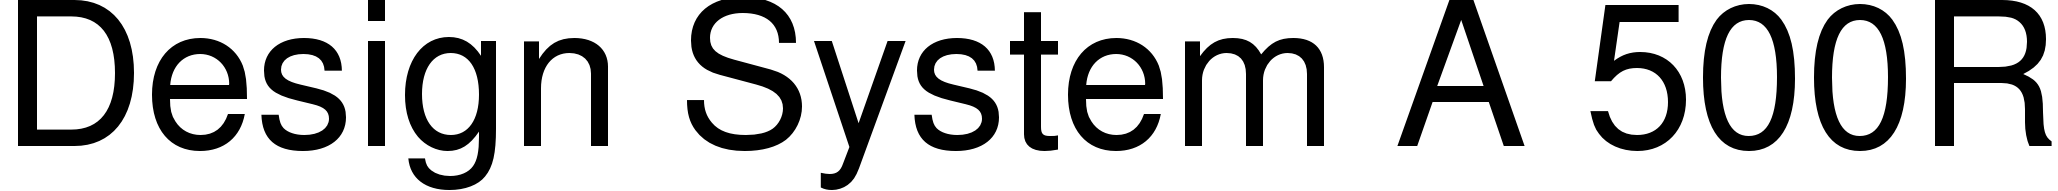 Design System A 500R